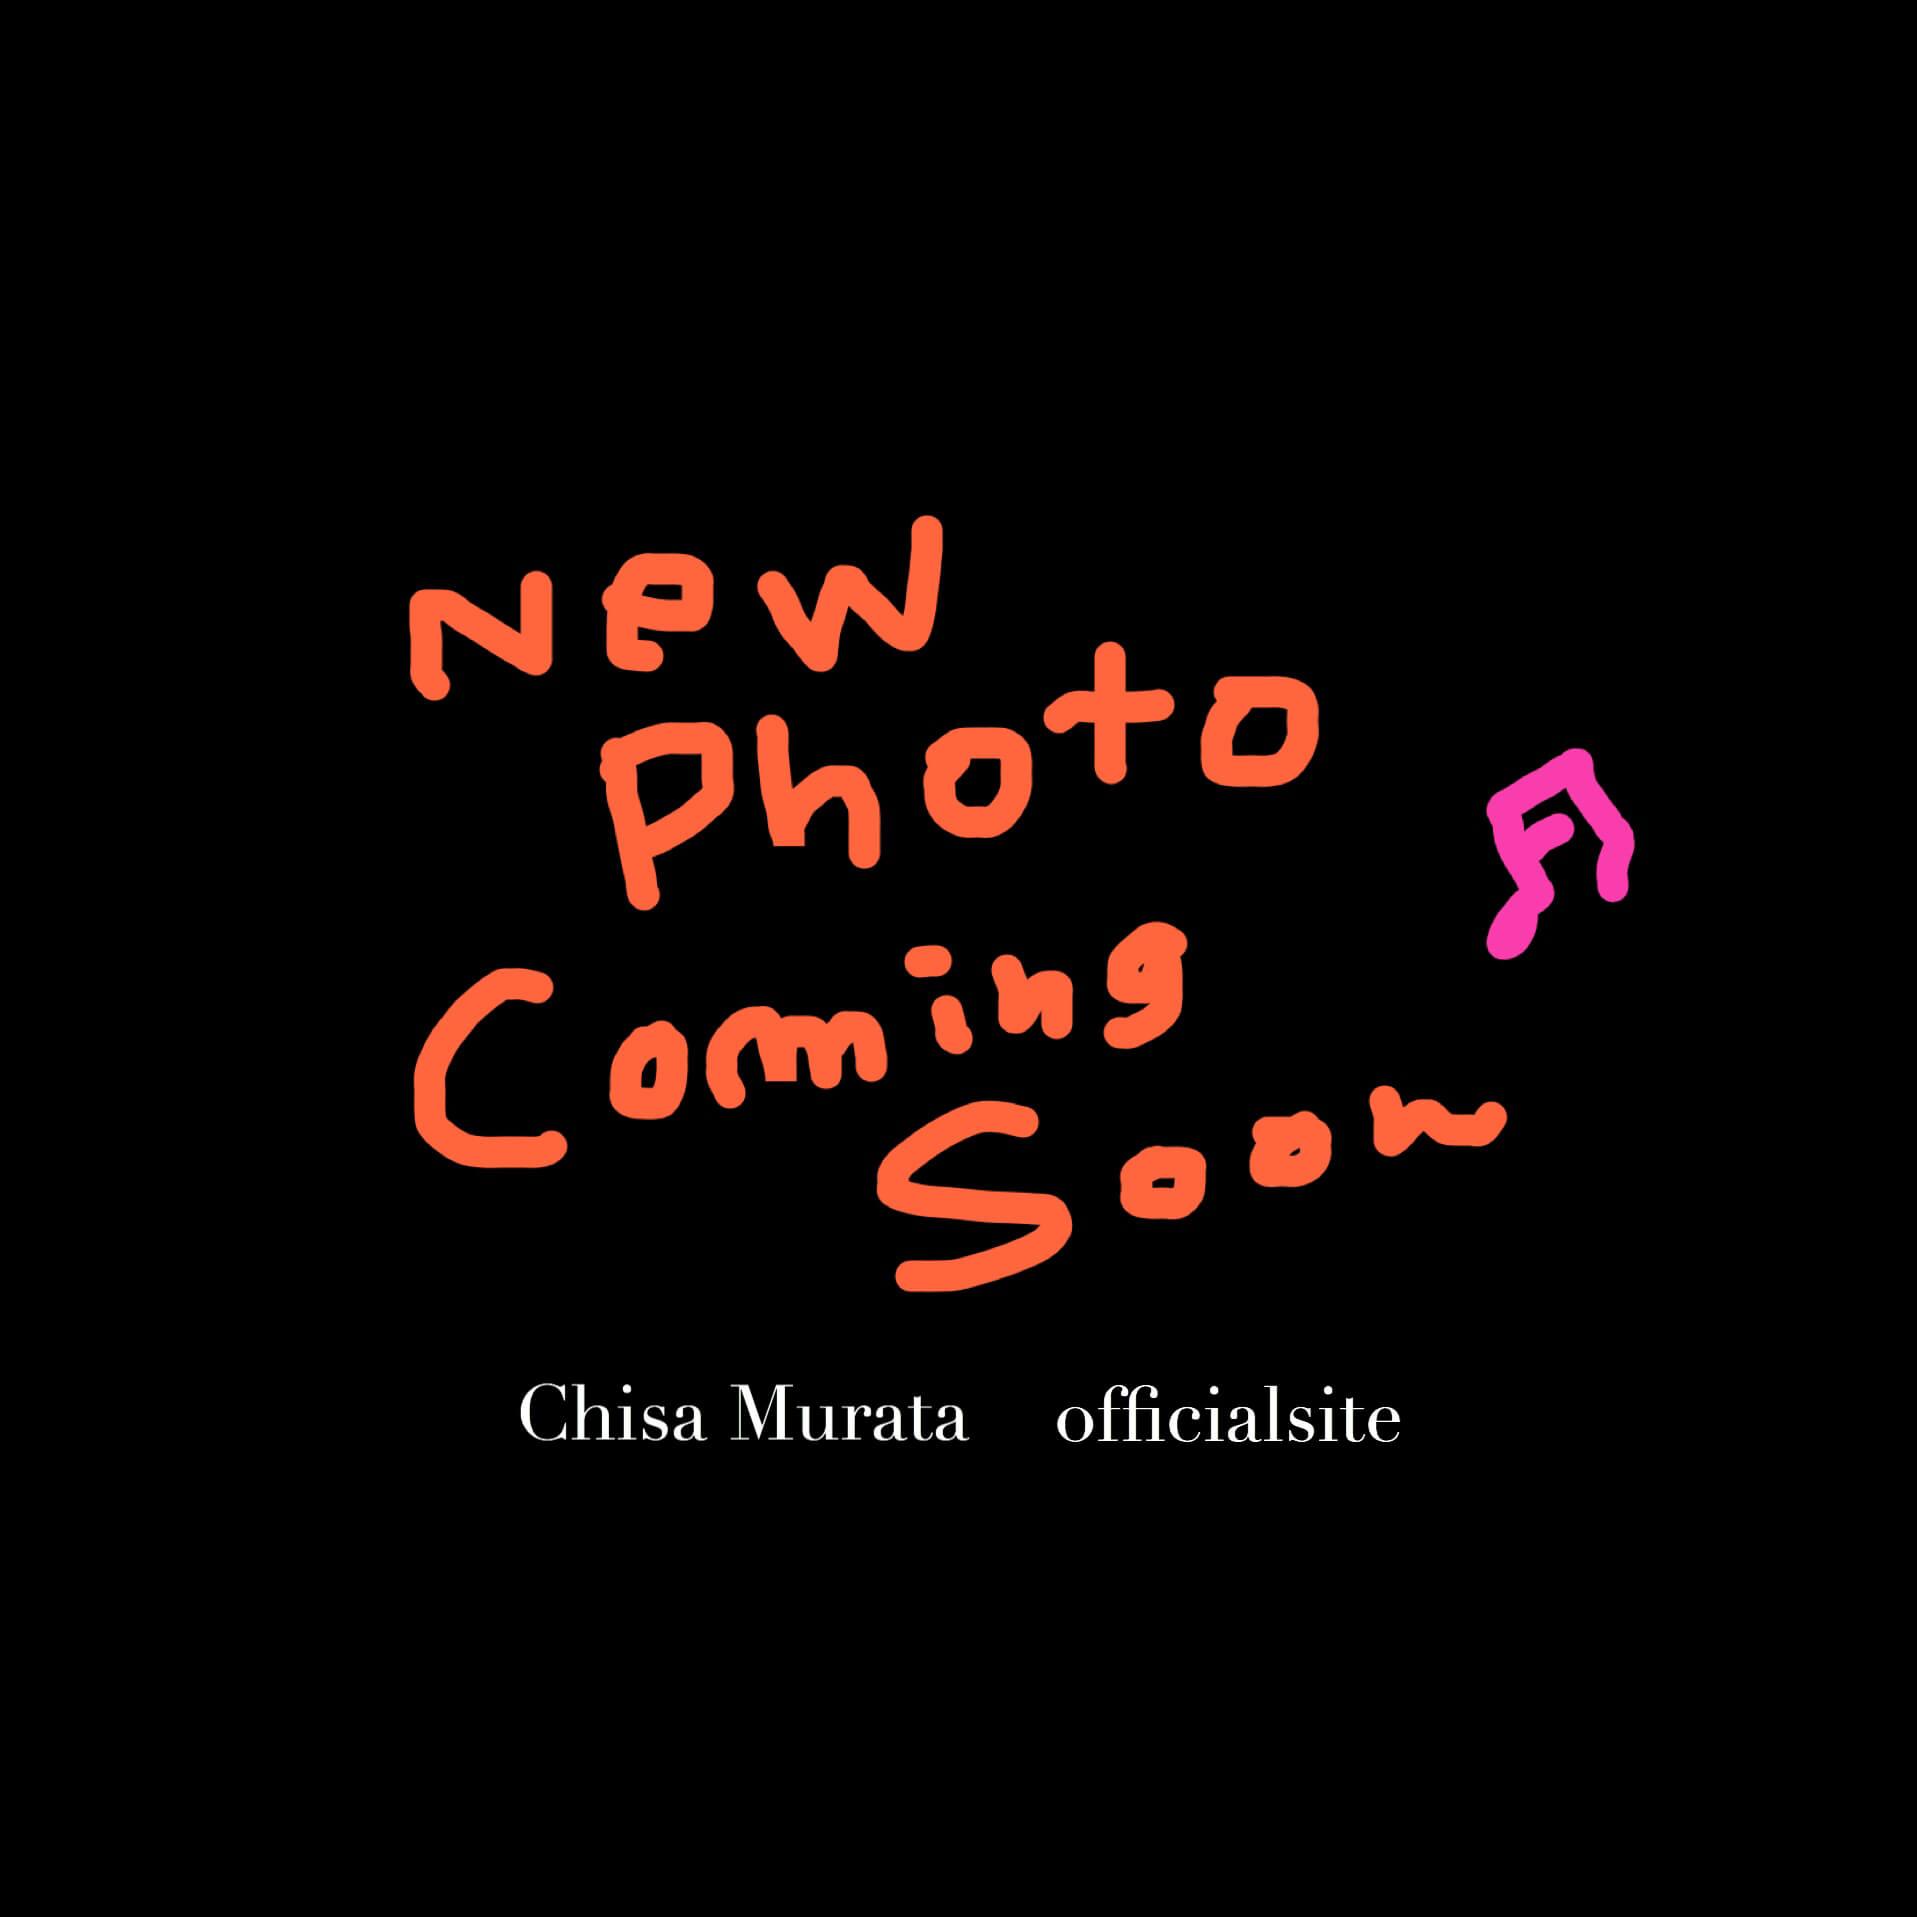 Chisa Murata officialsite